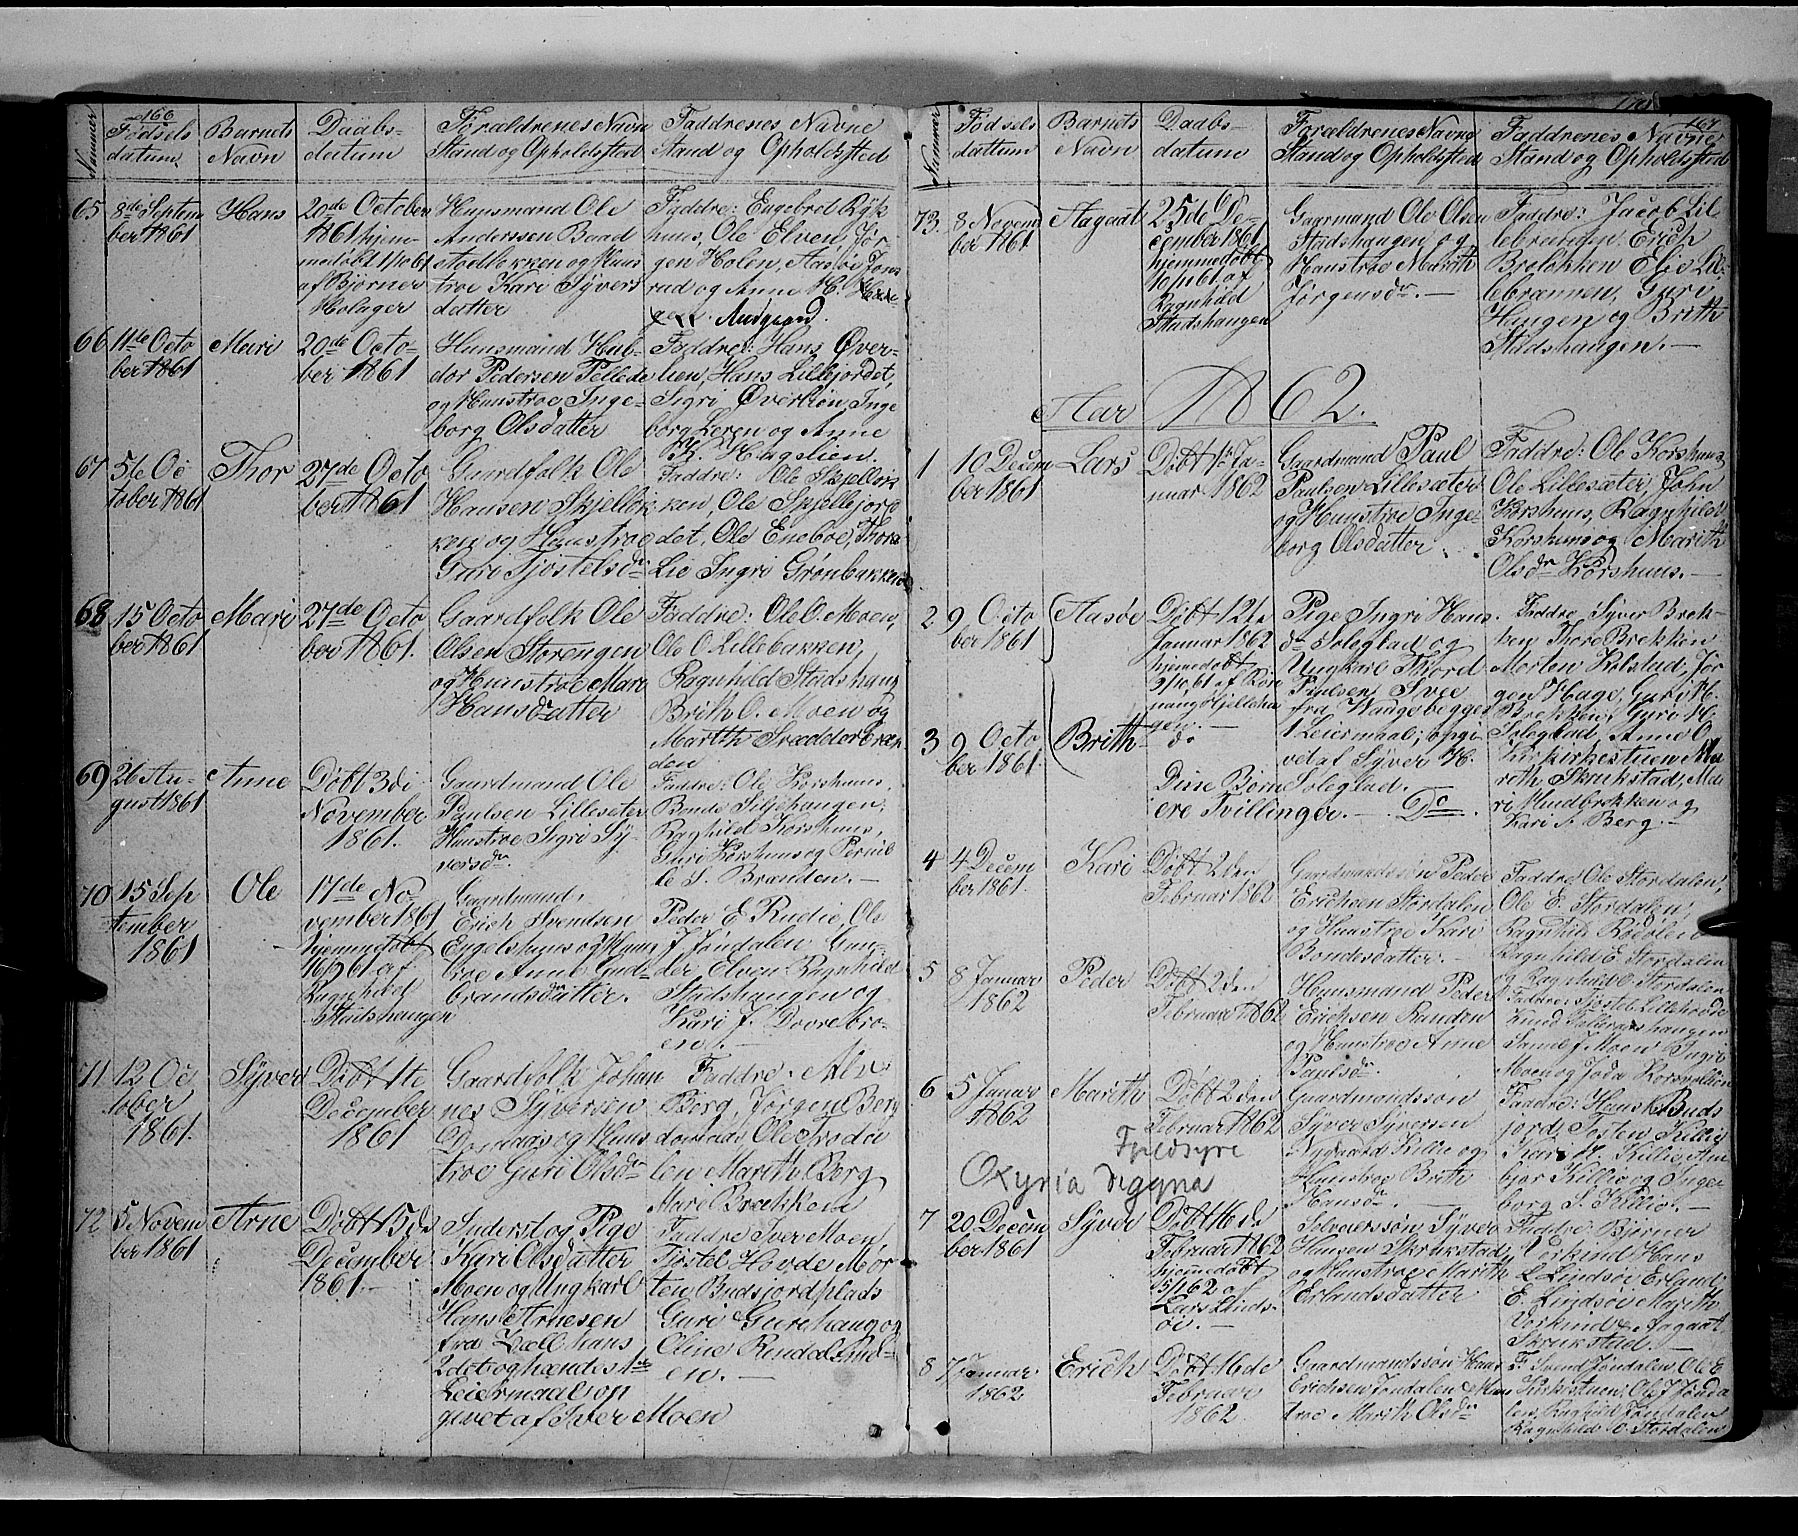 SAH, Lesja prestekontor, Klokkerbok nr. 3, 1842-1862, s. 266-267